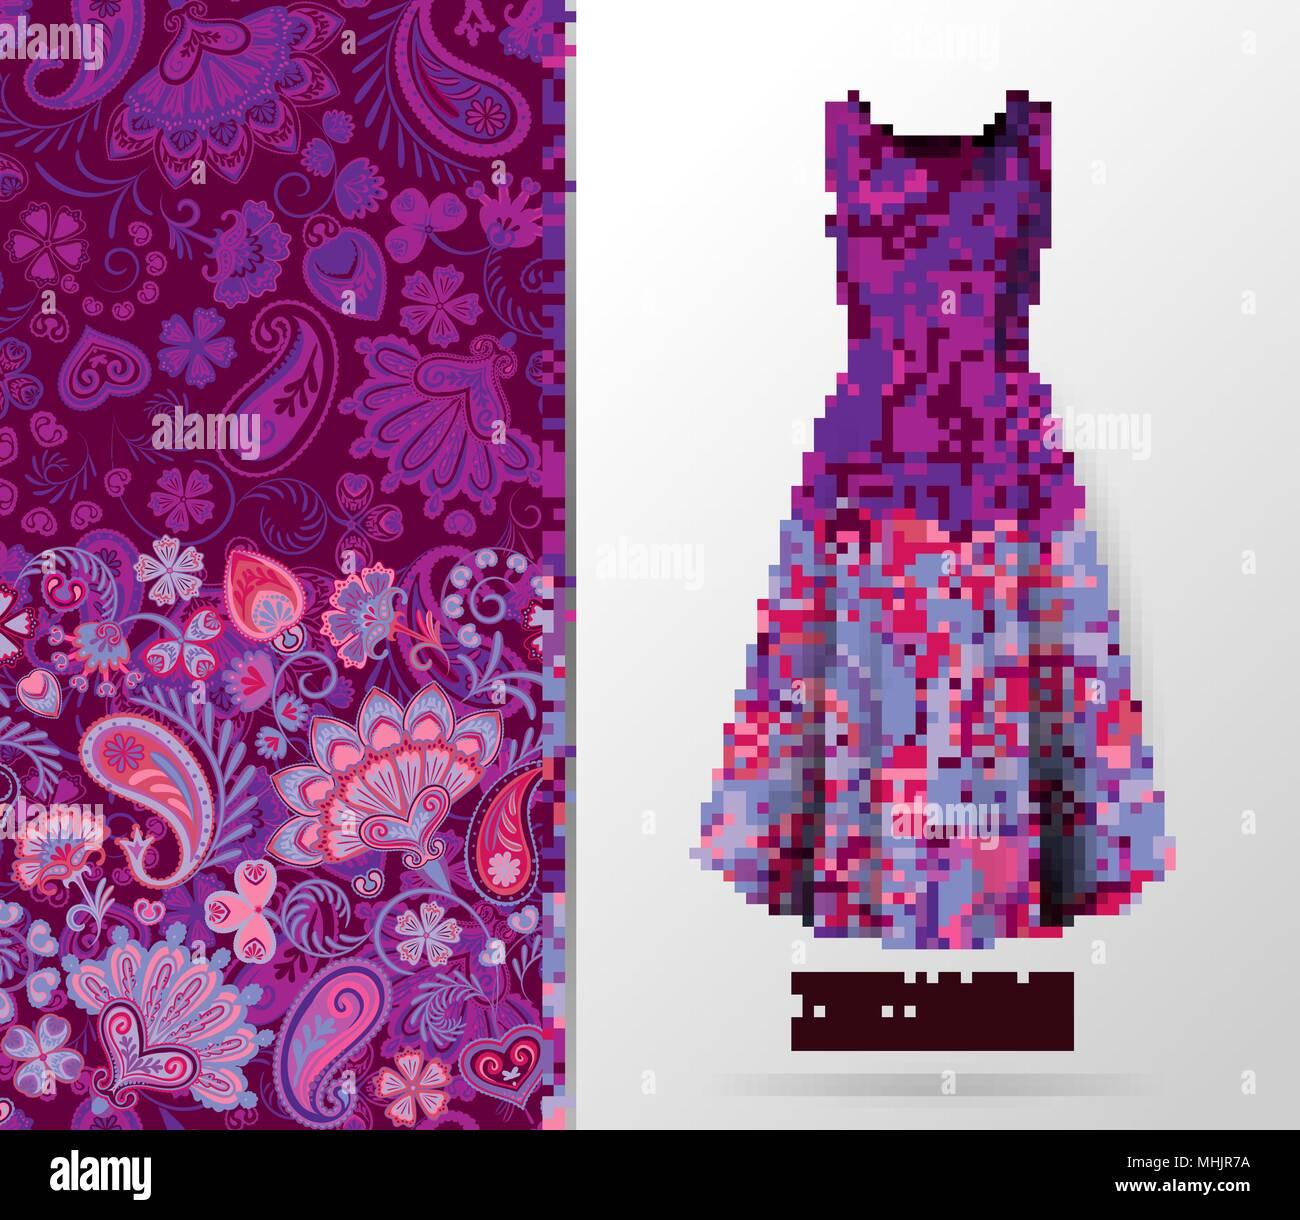 Purple Print Dress Stockfotos & Purple Print Dress Bilder - Alamy